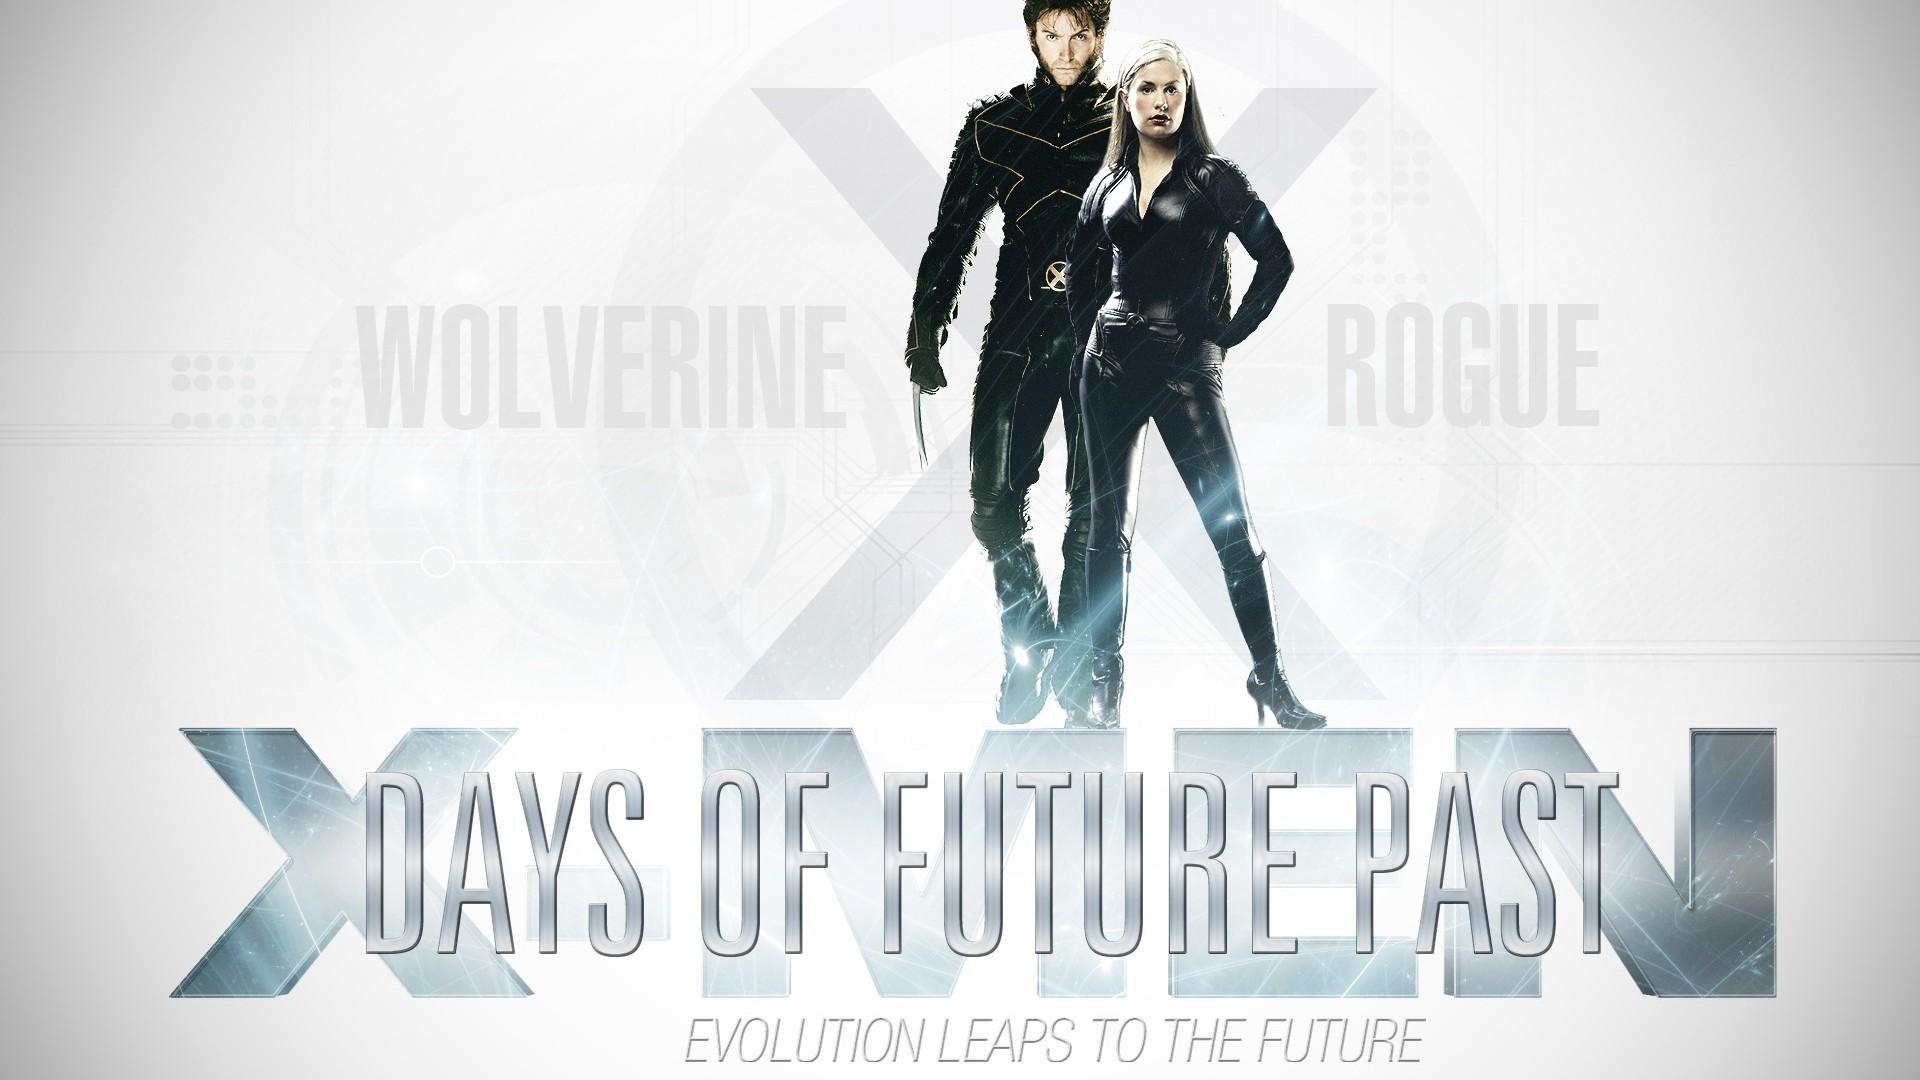 X Men Days of Future Past   Wallpaper High Definition 1920x1080